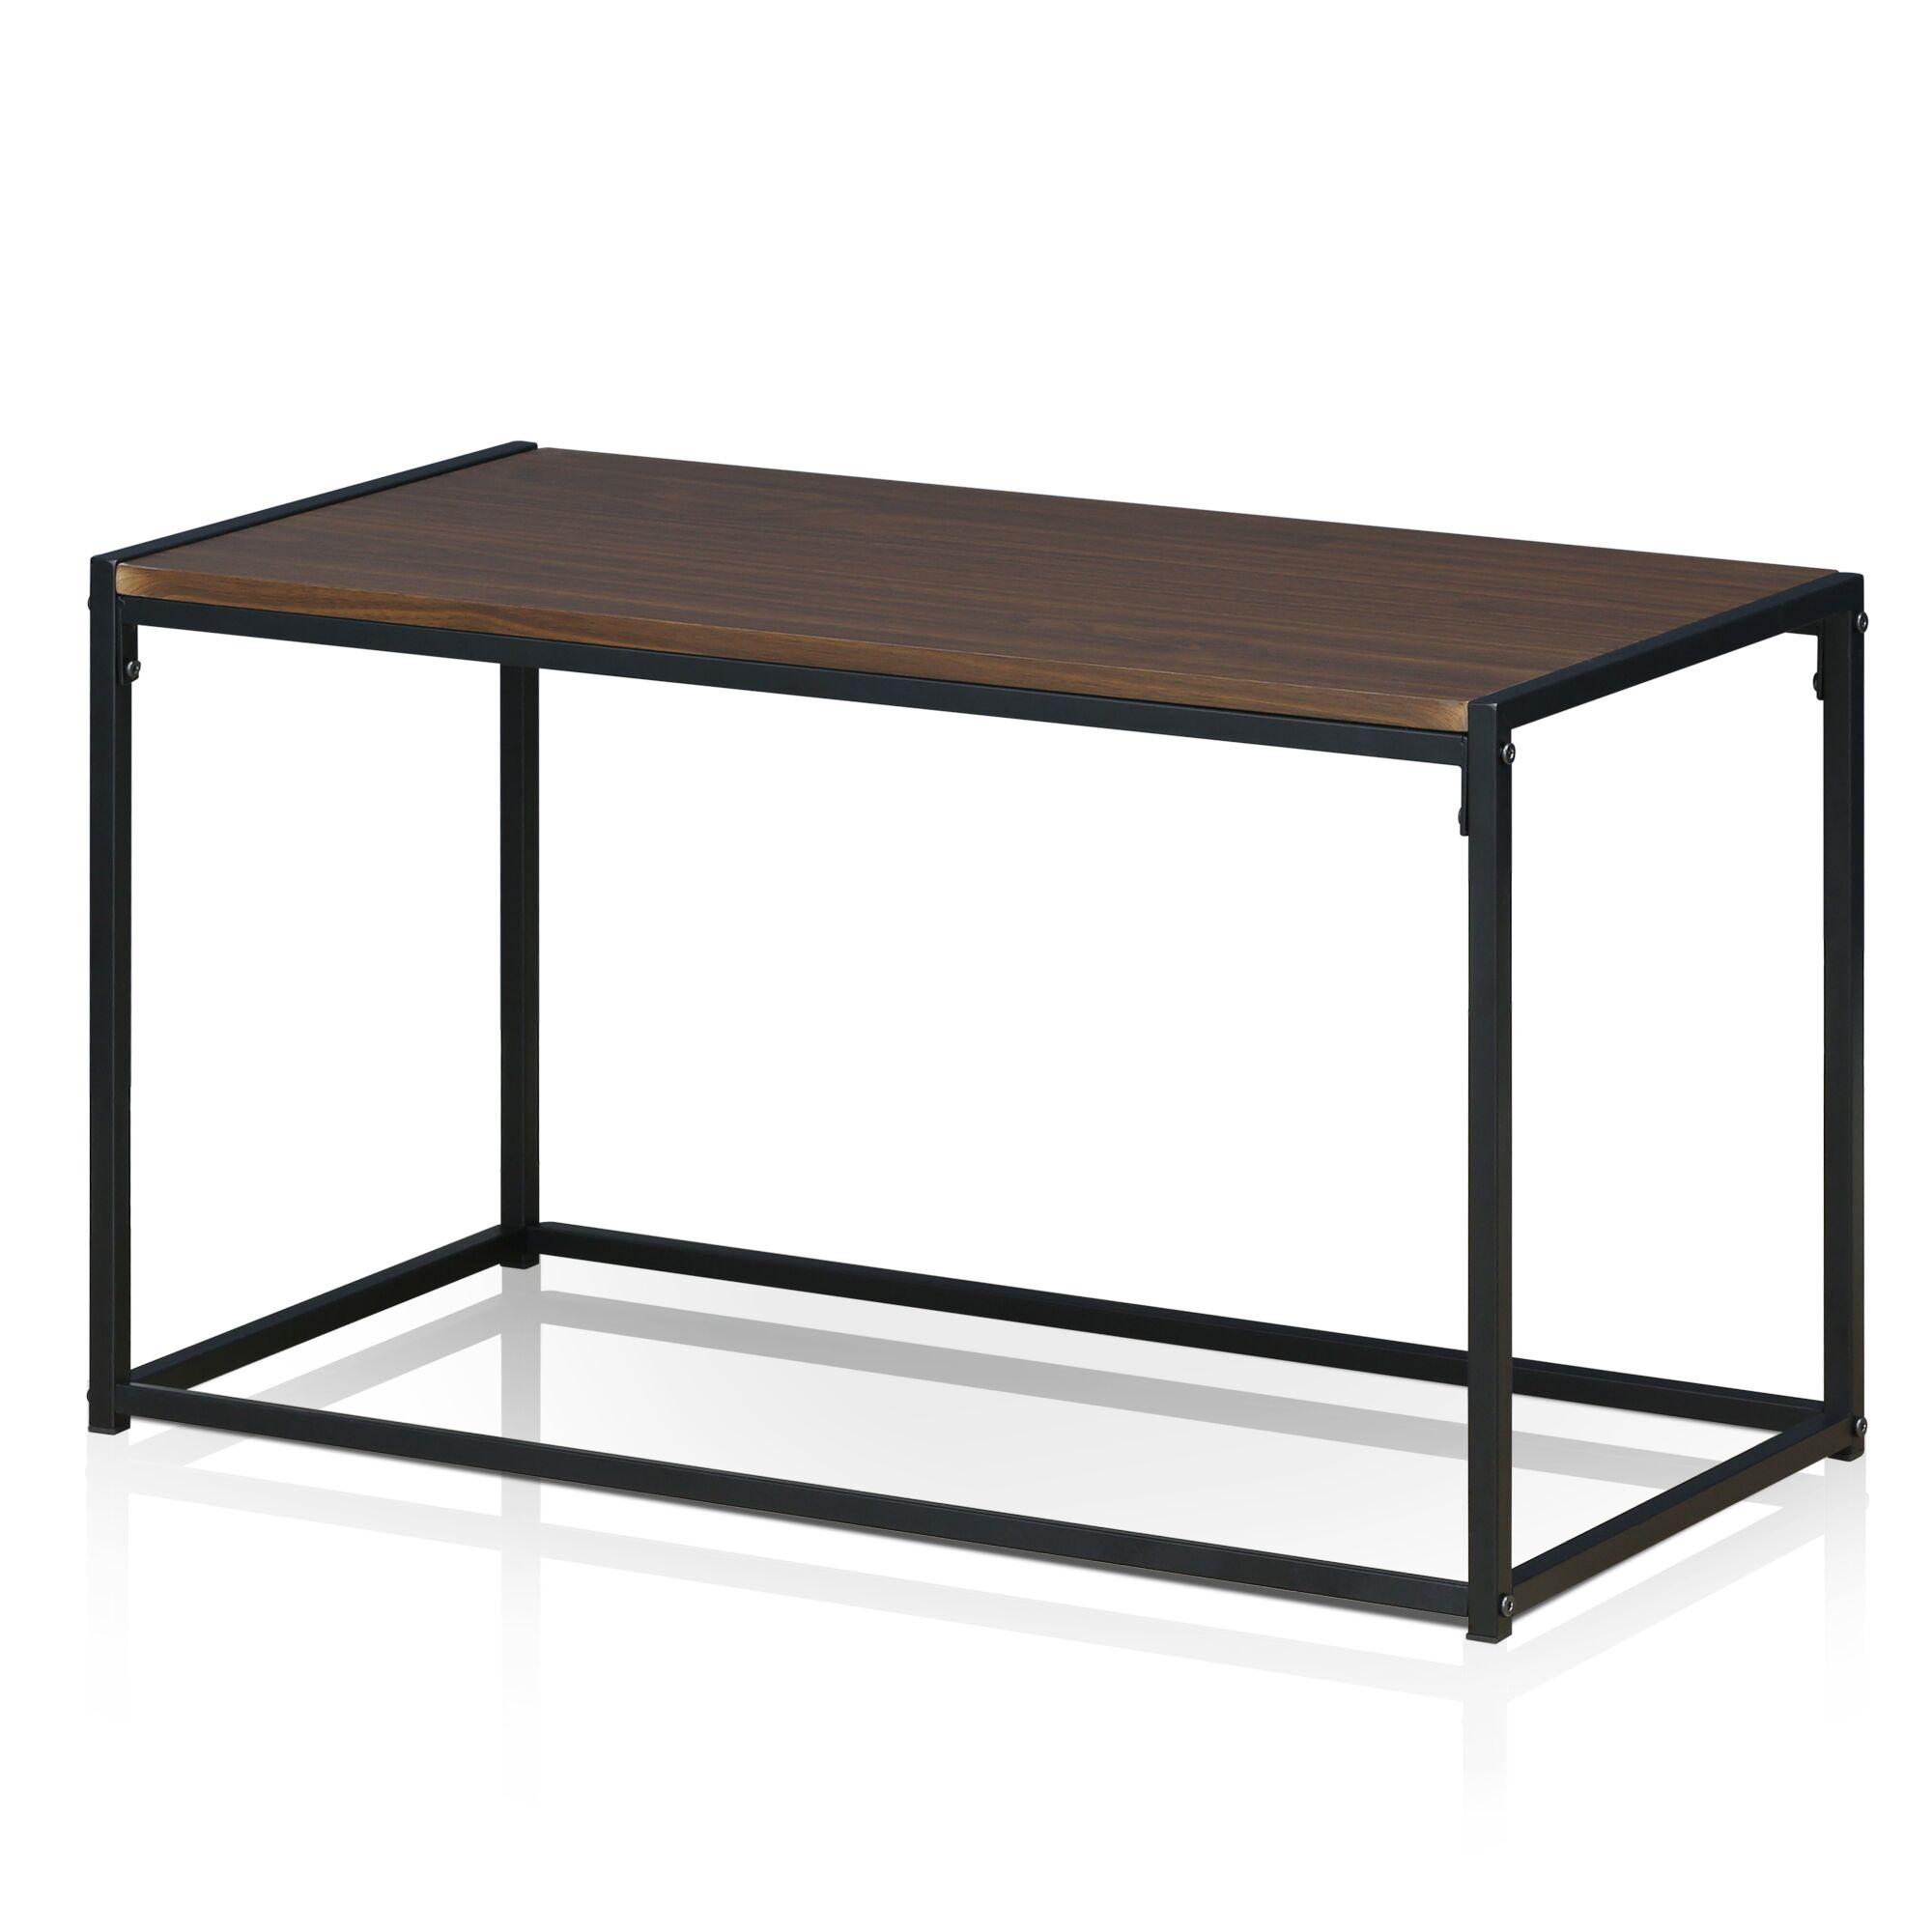 Andresen Modern Coffee Table Color: Dark Walnut